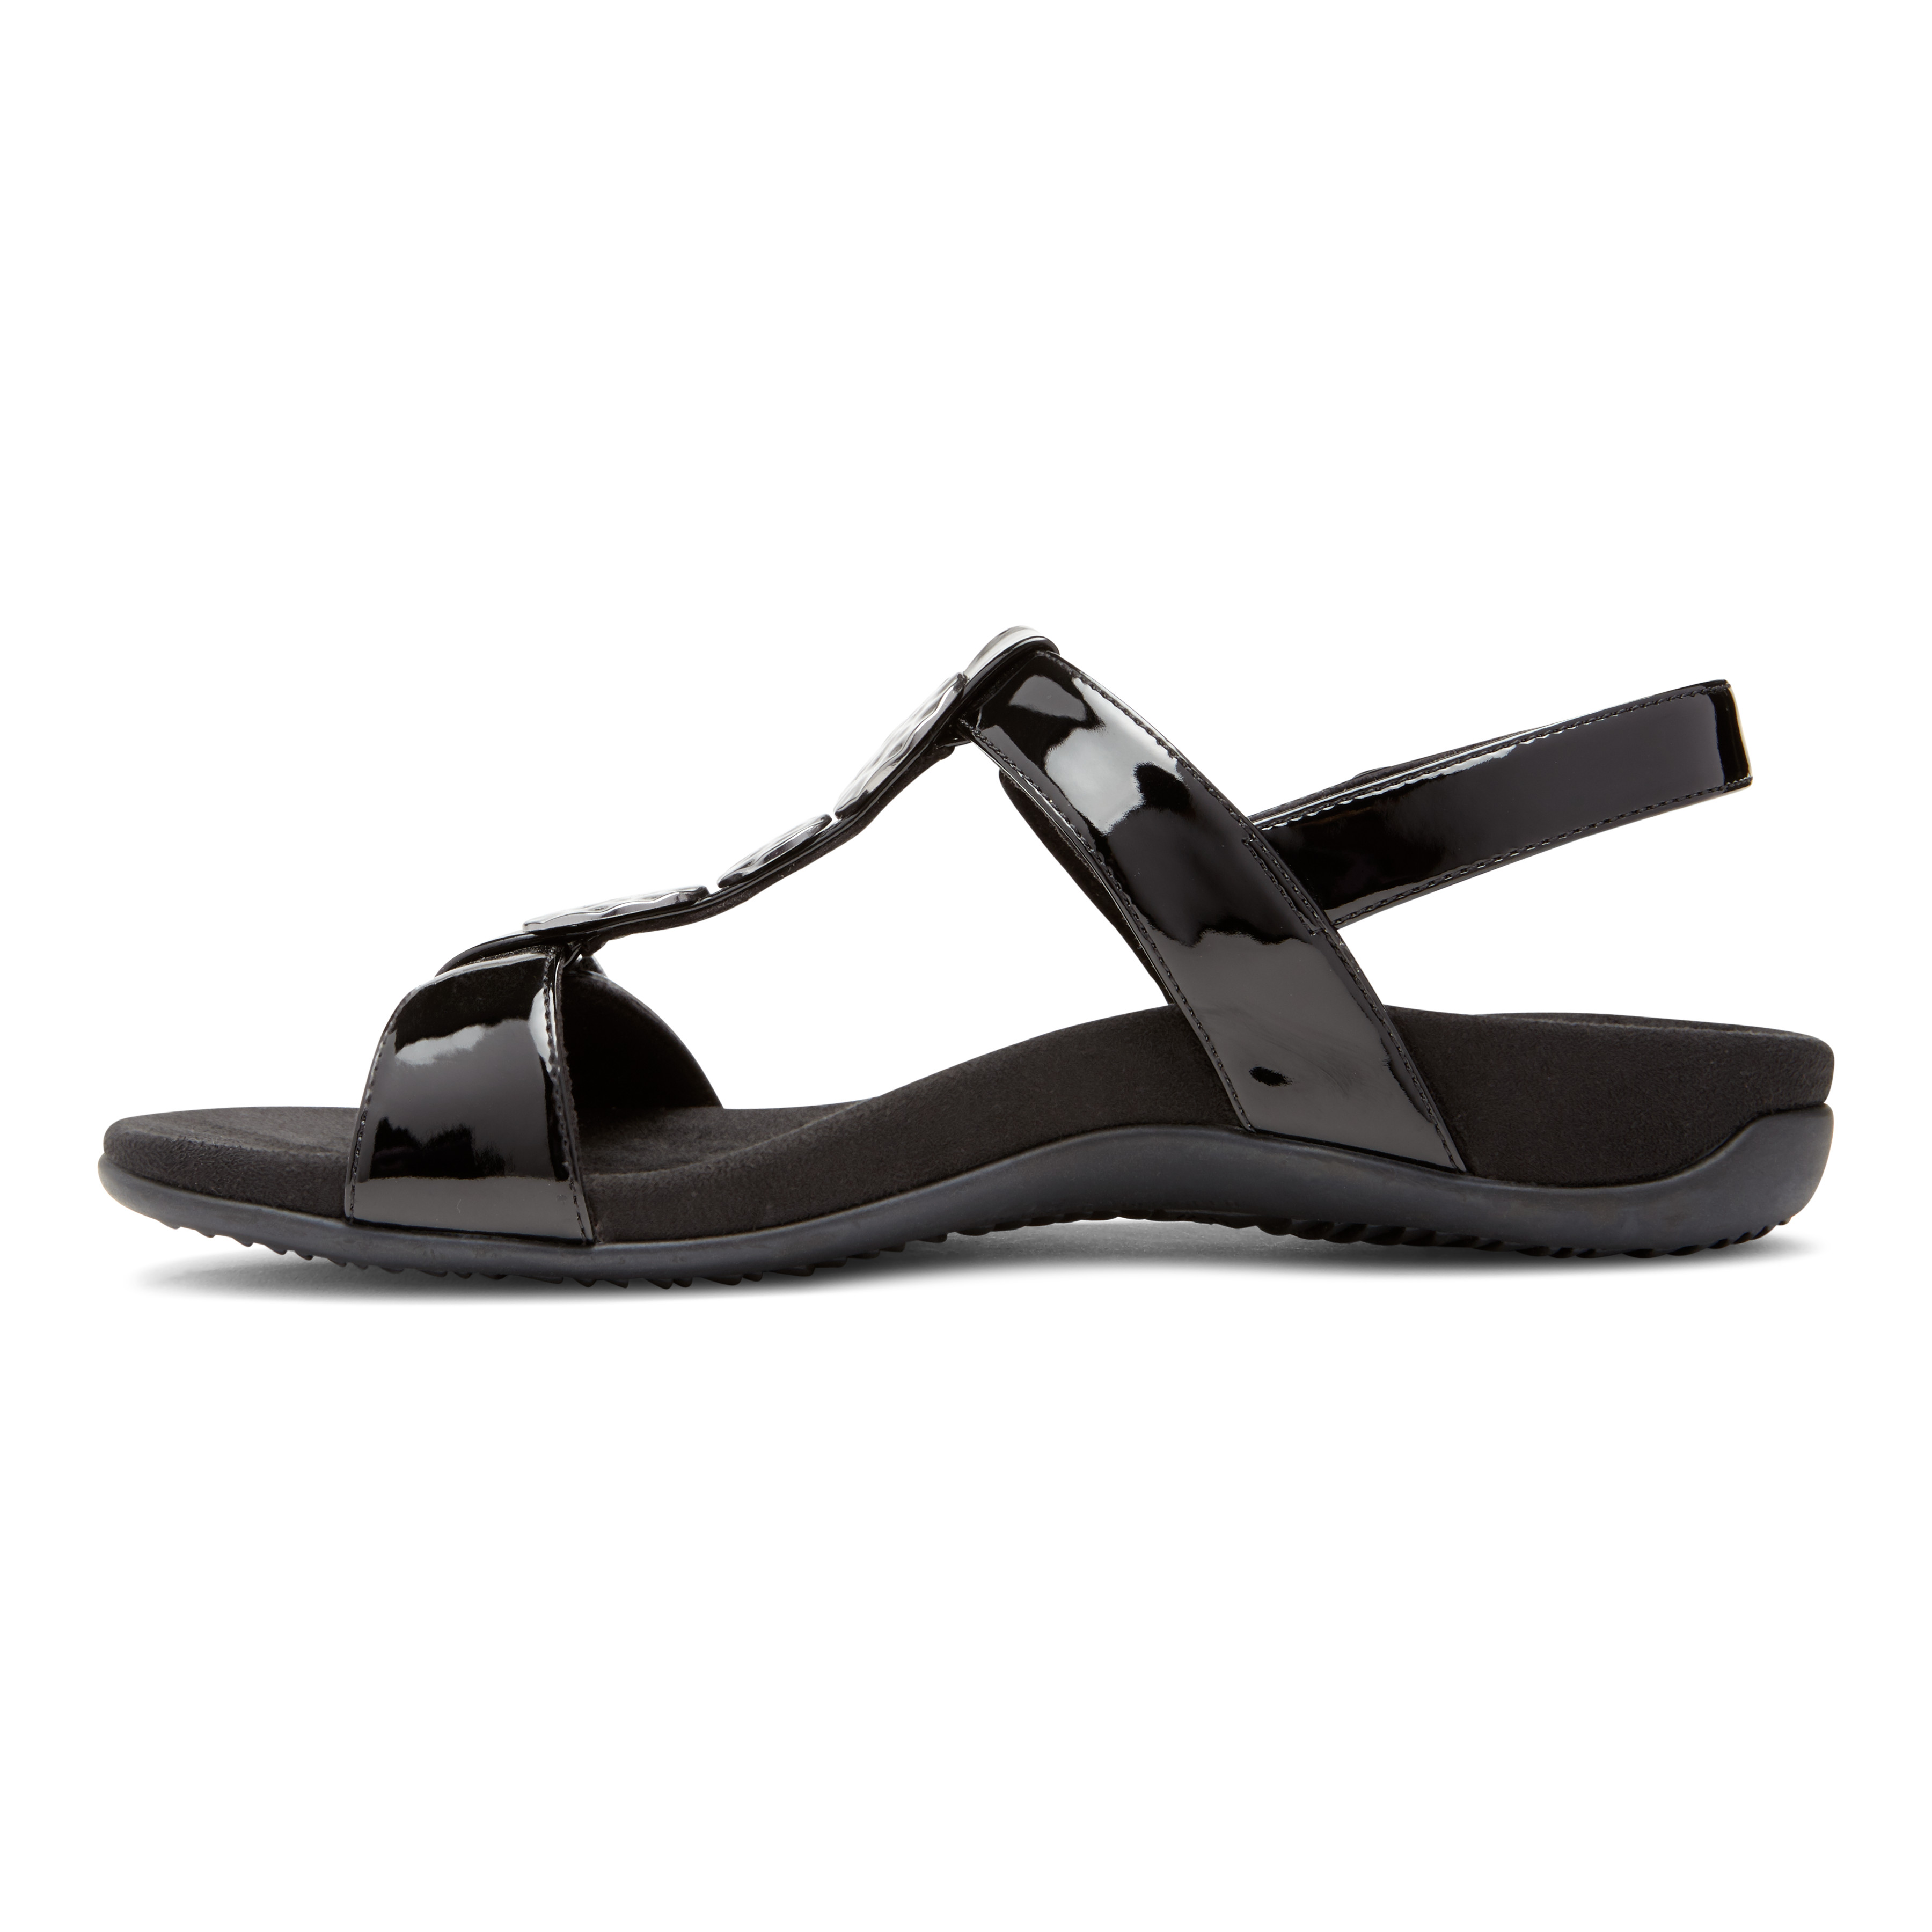 35dd9bfa176d Vionic Women s Rest Farra Backstrap Sandal Black Patent